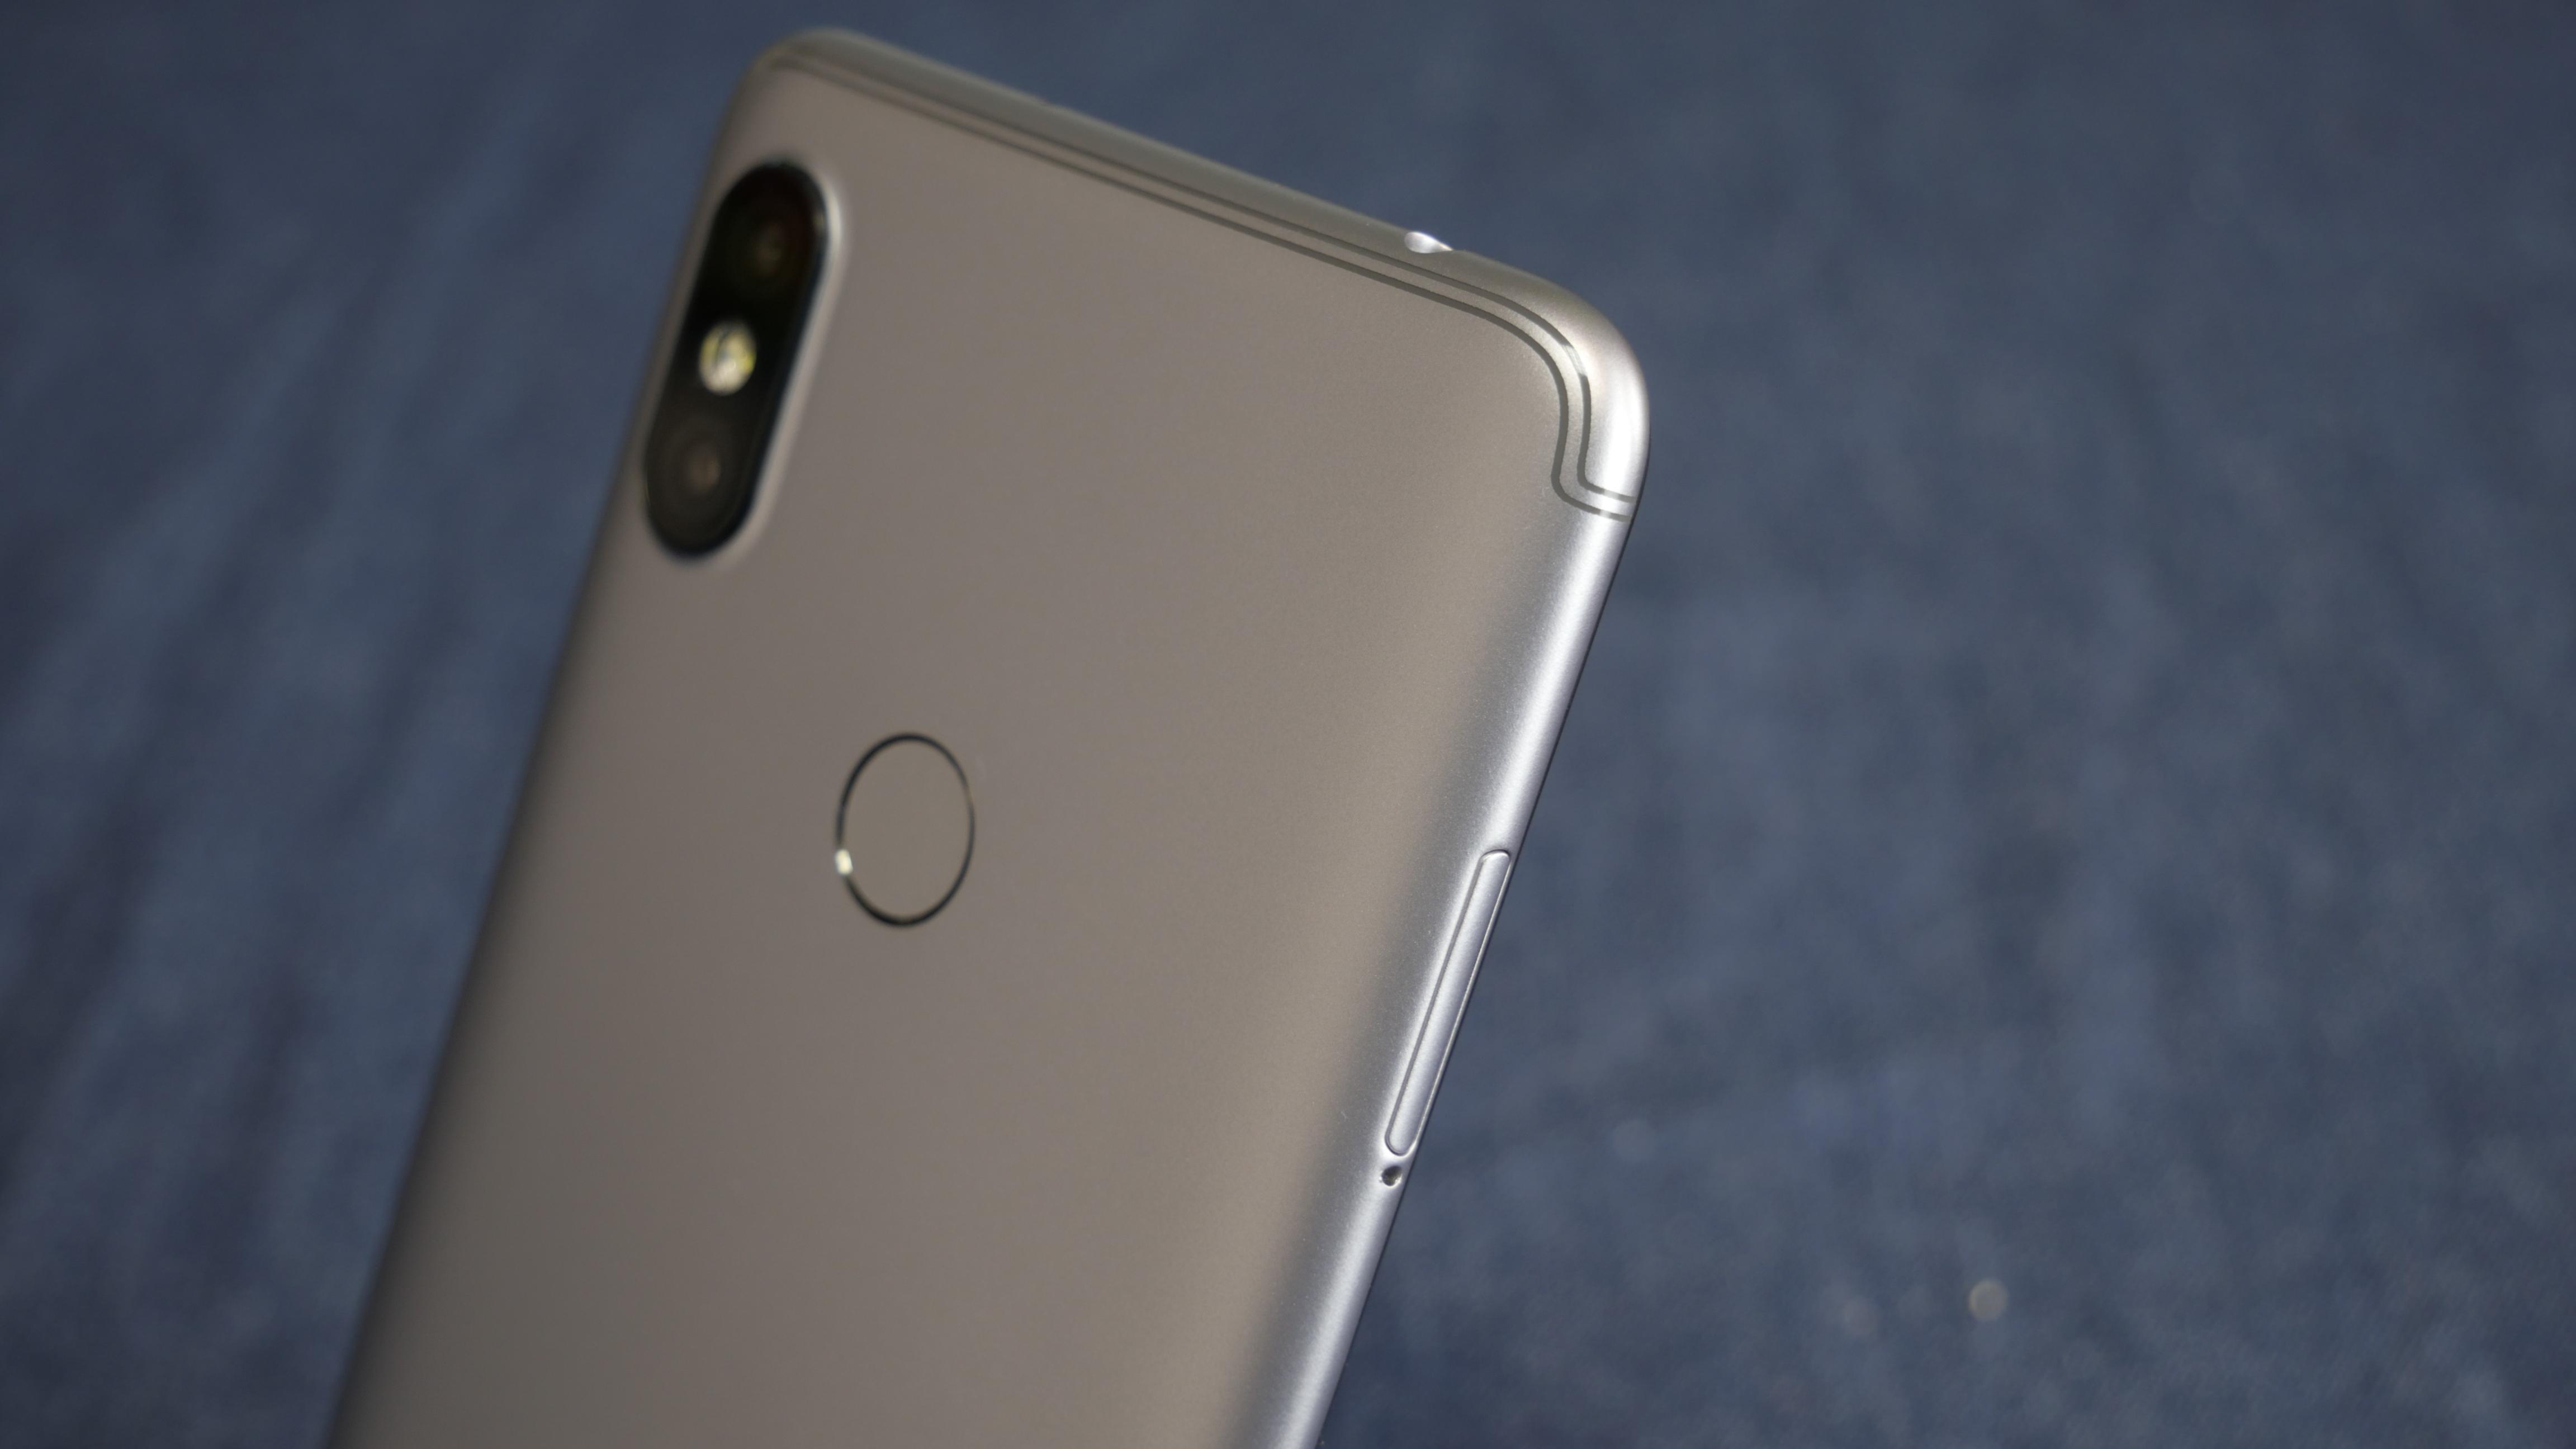 Xiaomi Redmi Note 6 : la Russie certifie l'appareil, la commercialisation approche